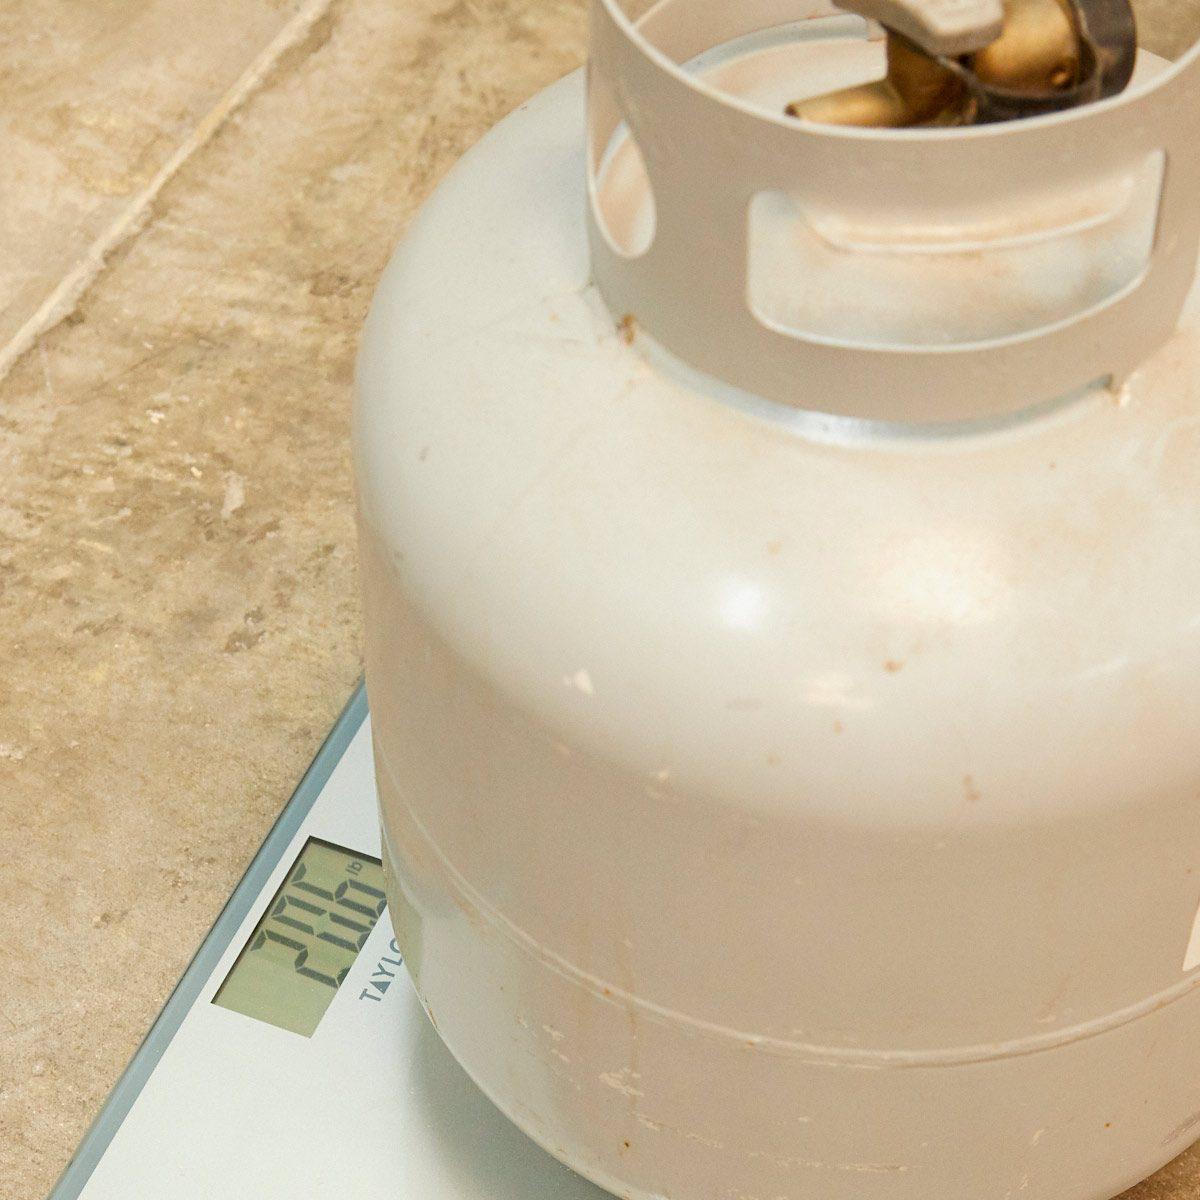 HH propane tank bathroom scale